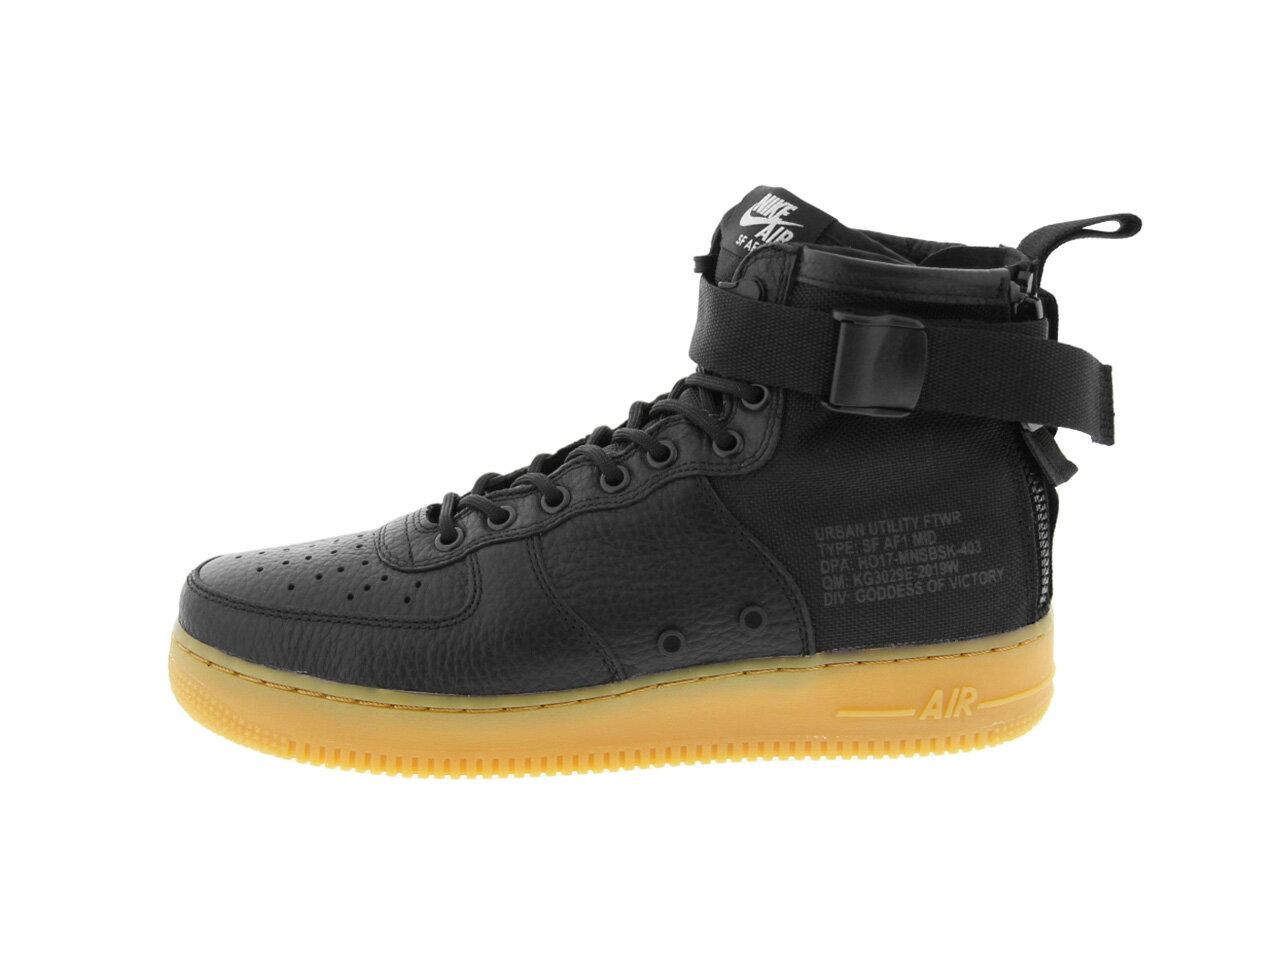 NIKE SF AF1 MID(917753-003)BLACK/BLACK-GUM LIGHT BROWN【ナイキ スペシャルフィールド エアフォースワン ミッド】【メンズファッション】【ナイキスニーカー】【靴】